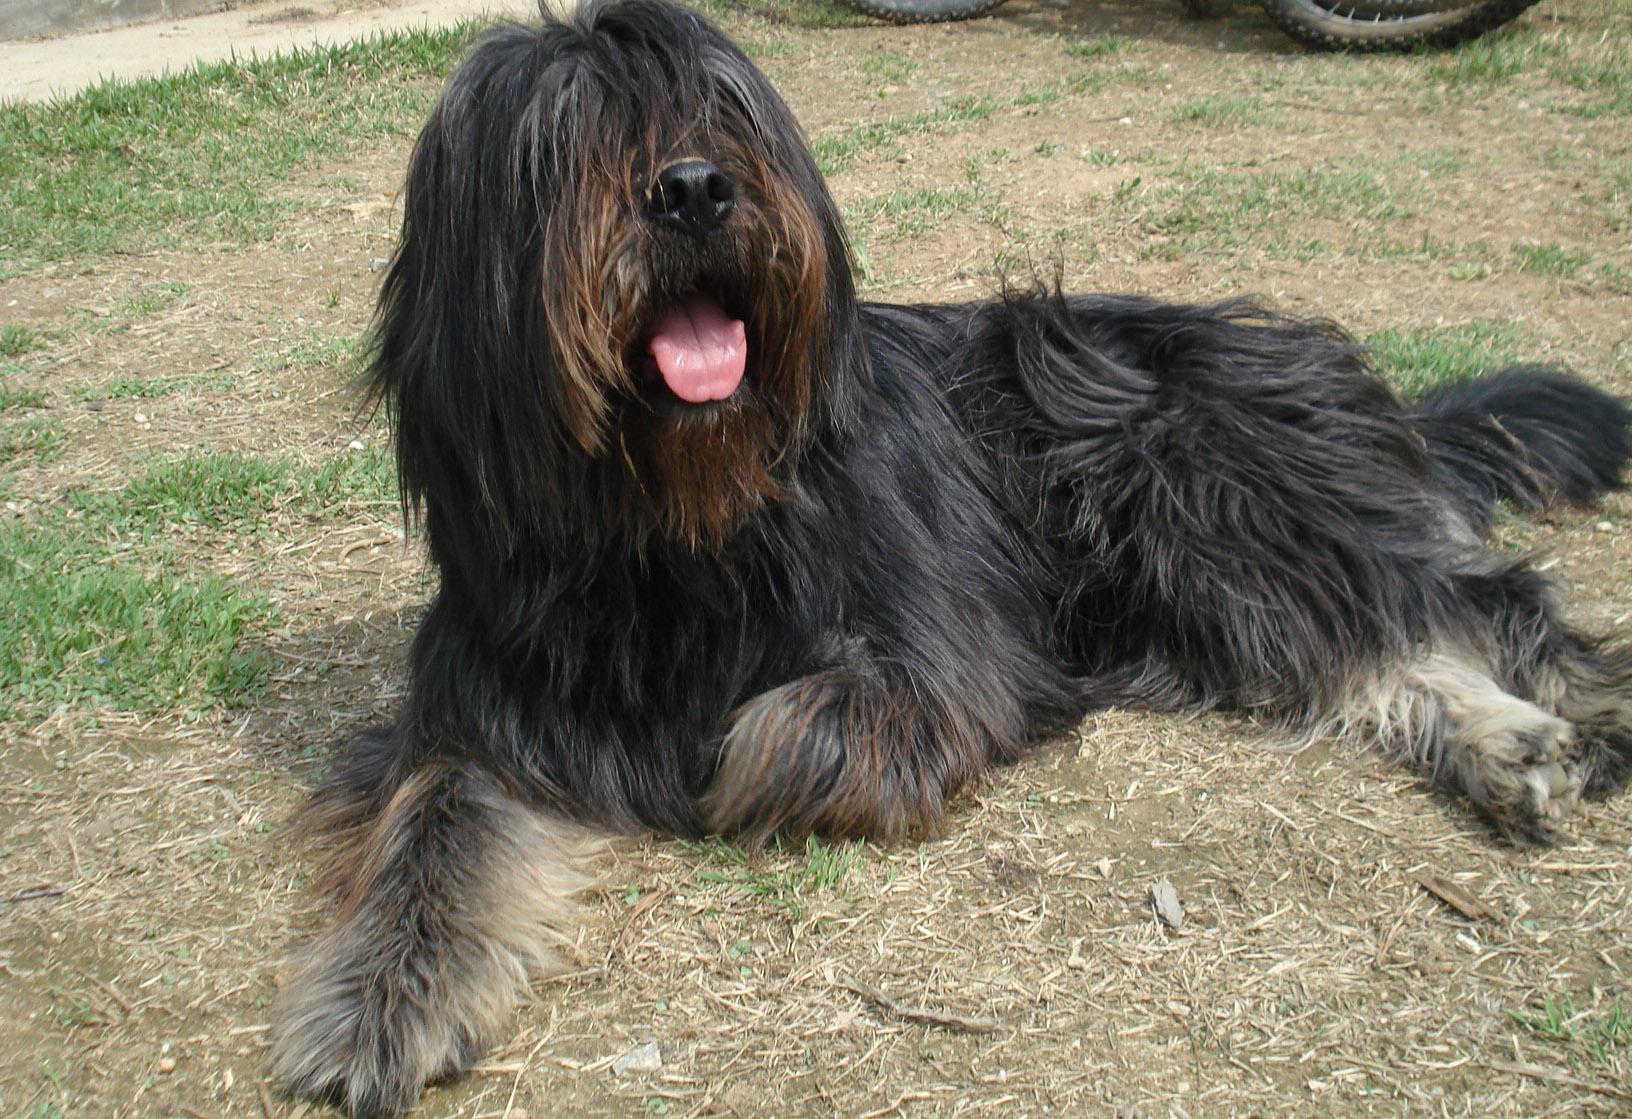 Sapsali dog on the sand photo and wallpaper. Beautiful Sapsali dog on ...